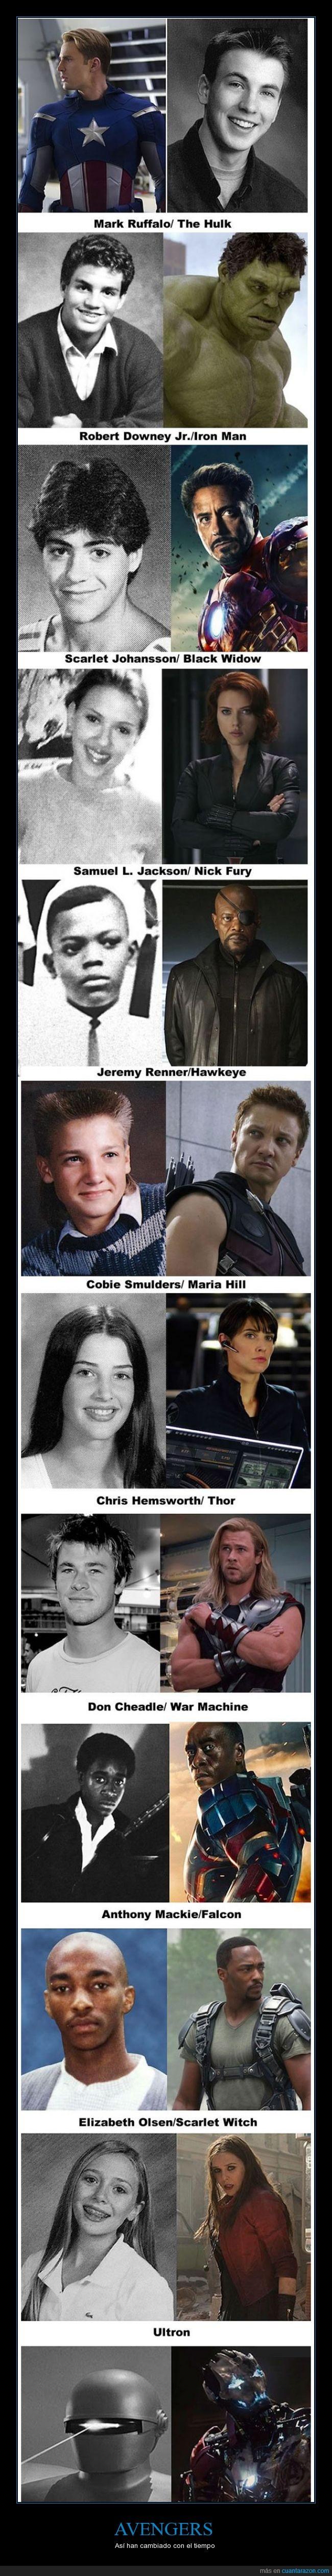 Avengers,edades,Marvel,superheroe